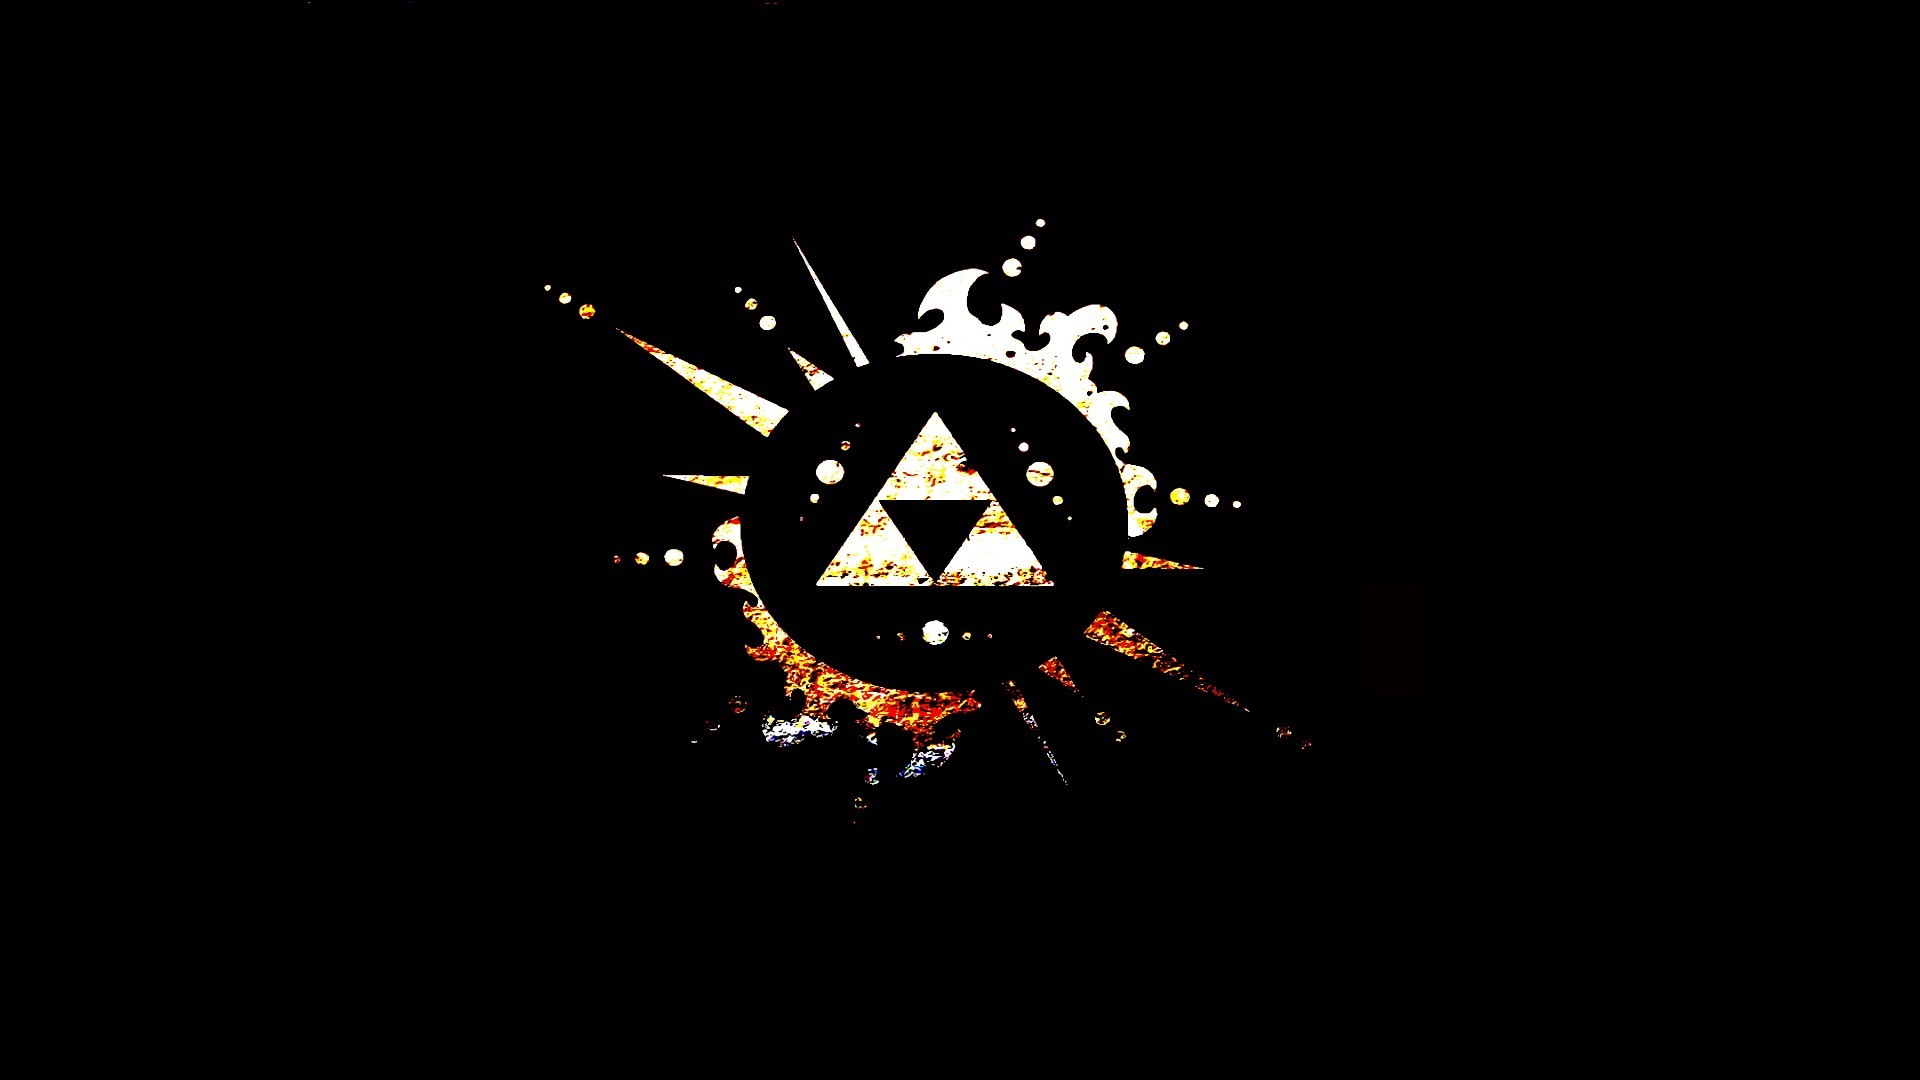 Zelda Hd Wallpaper Sf Wallpaper